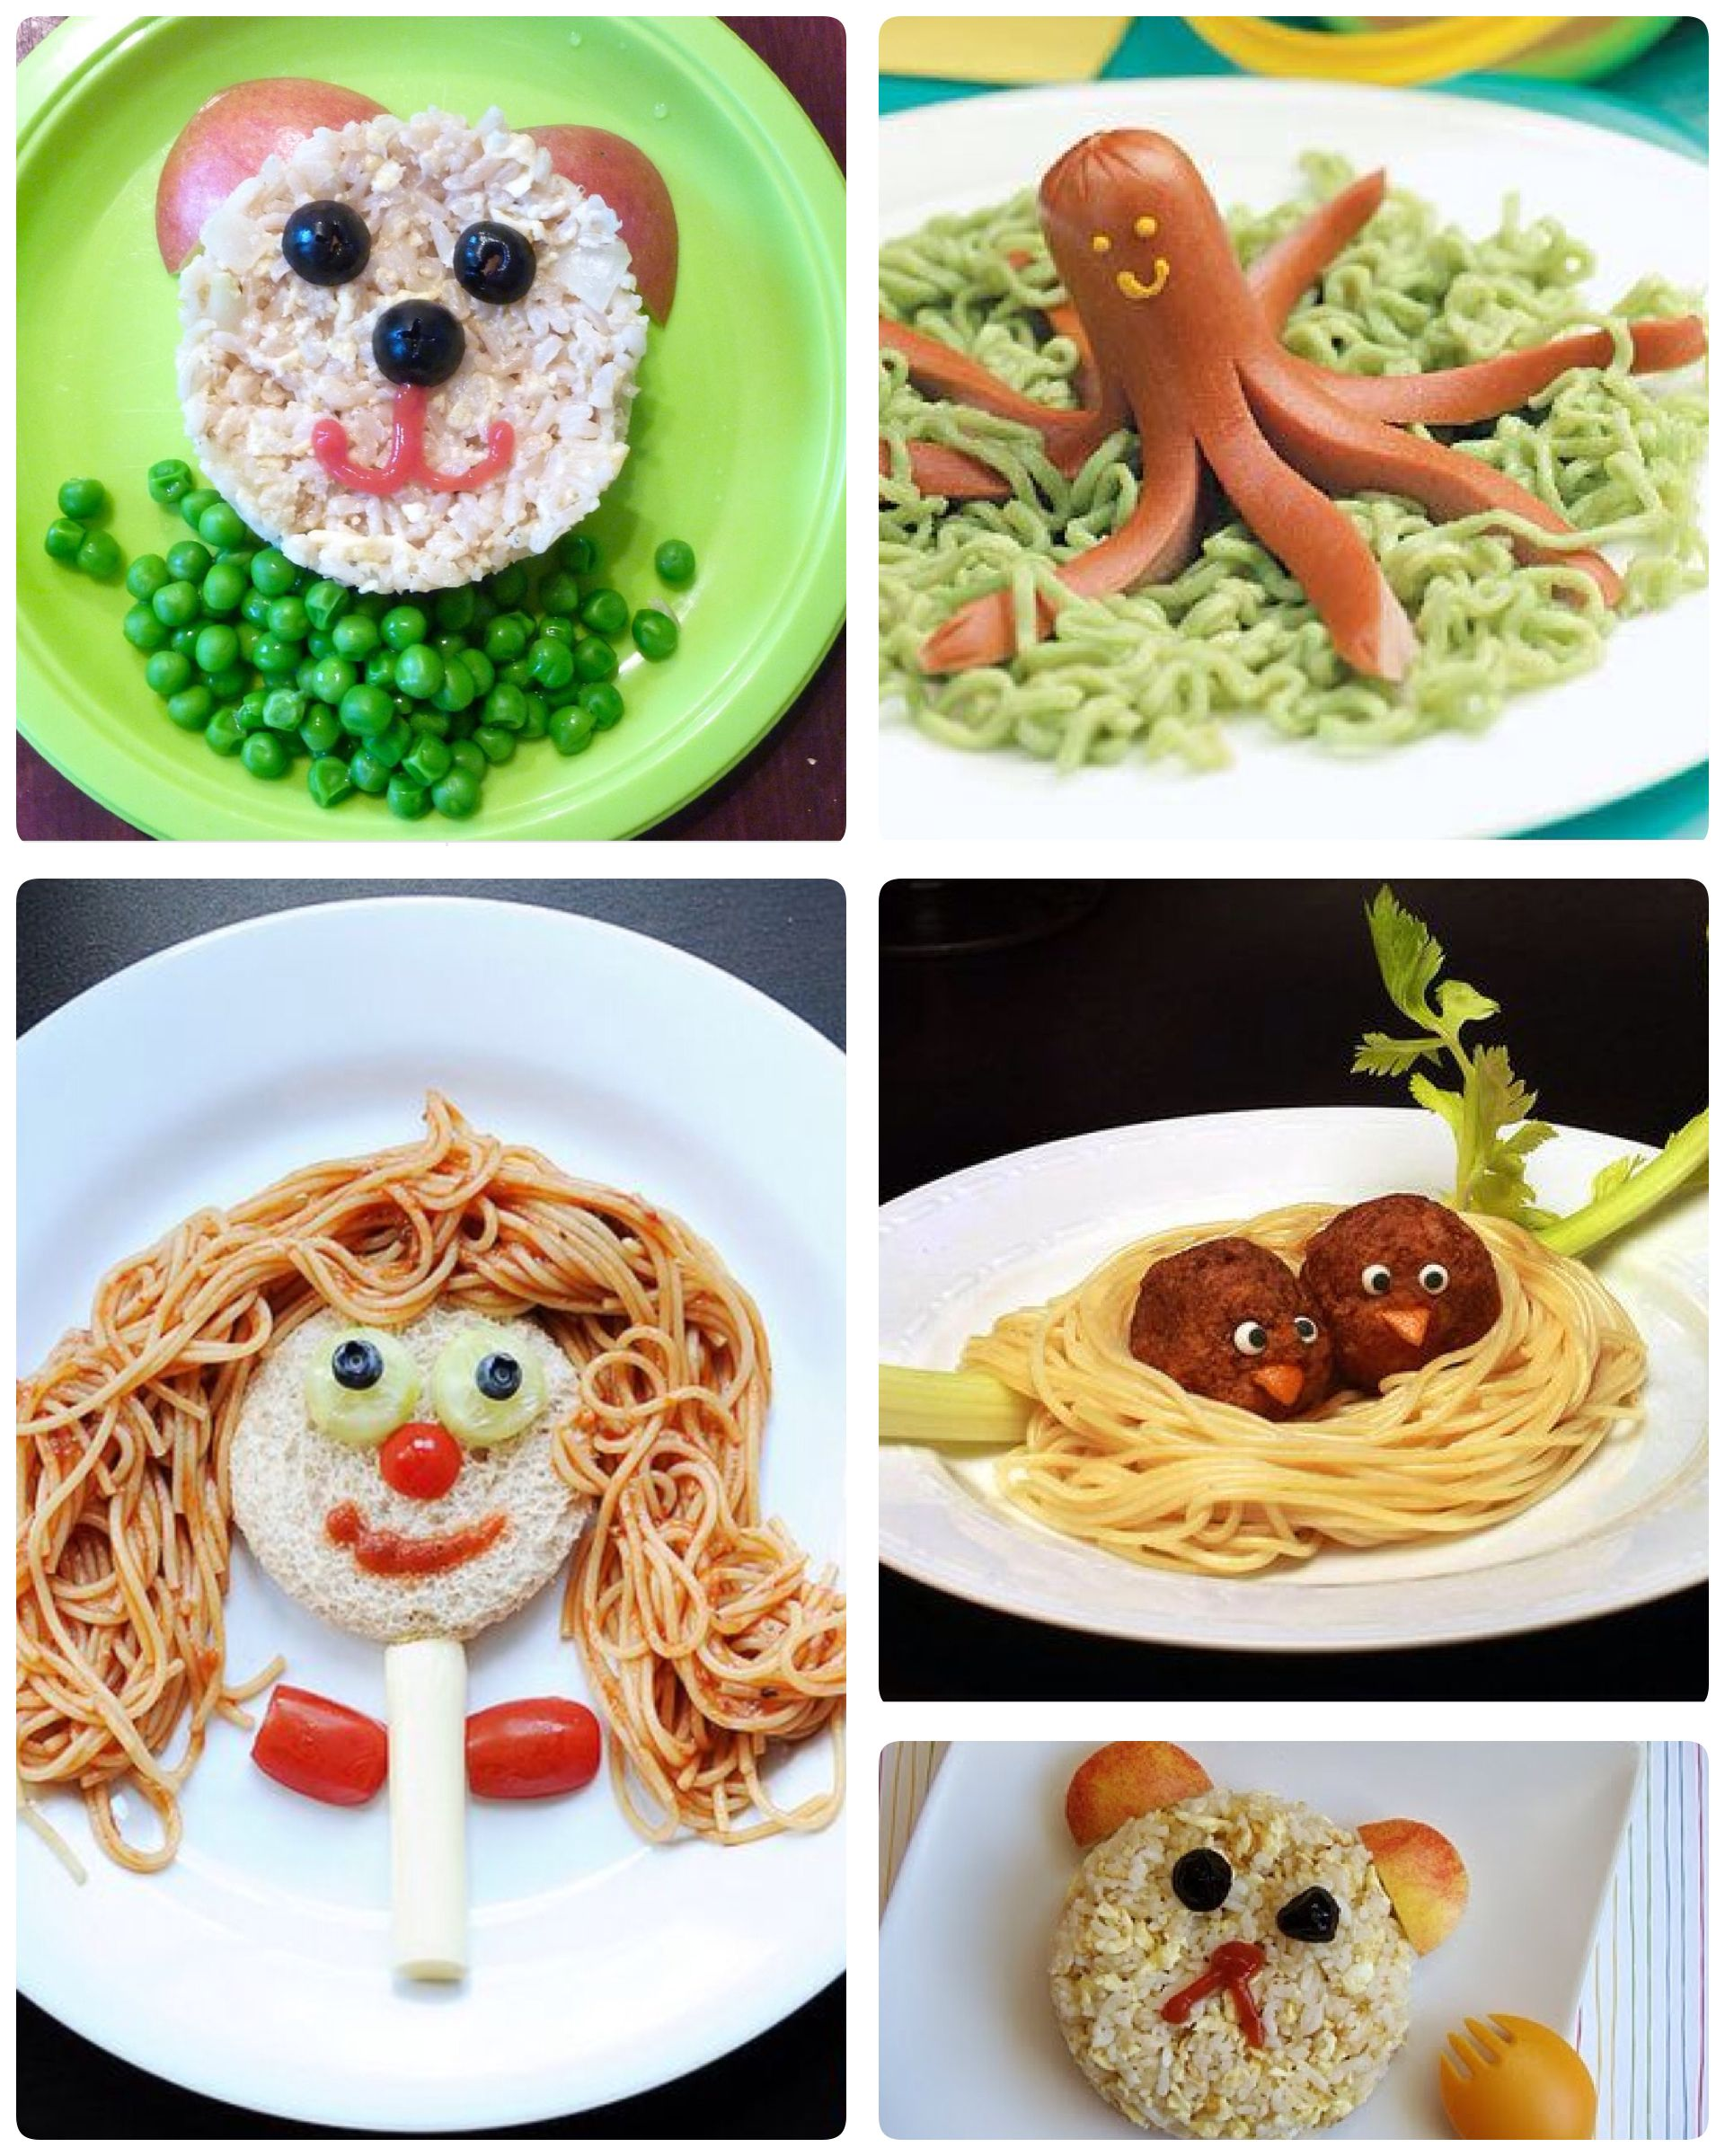 Decorar platos para ni os comida para ni os pinterest - Platos sencillos y sanos ...